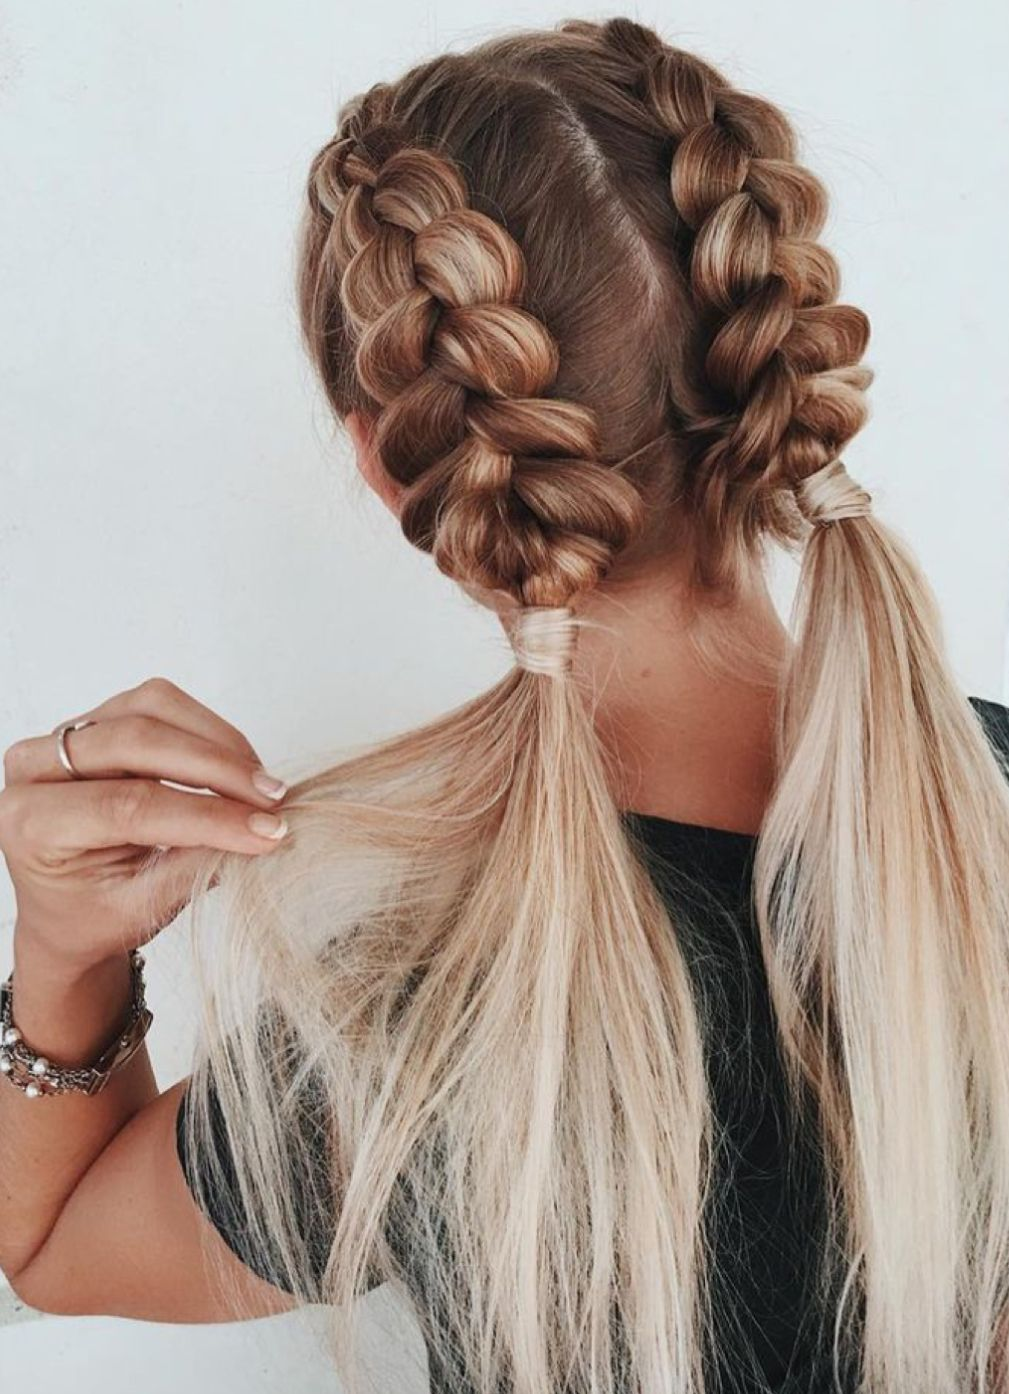 Pin by jaden rose on semi formal hair styles pinterest hair